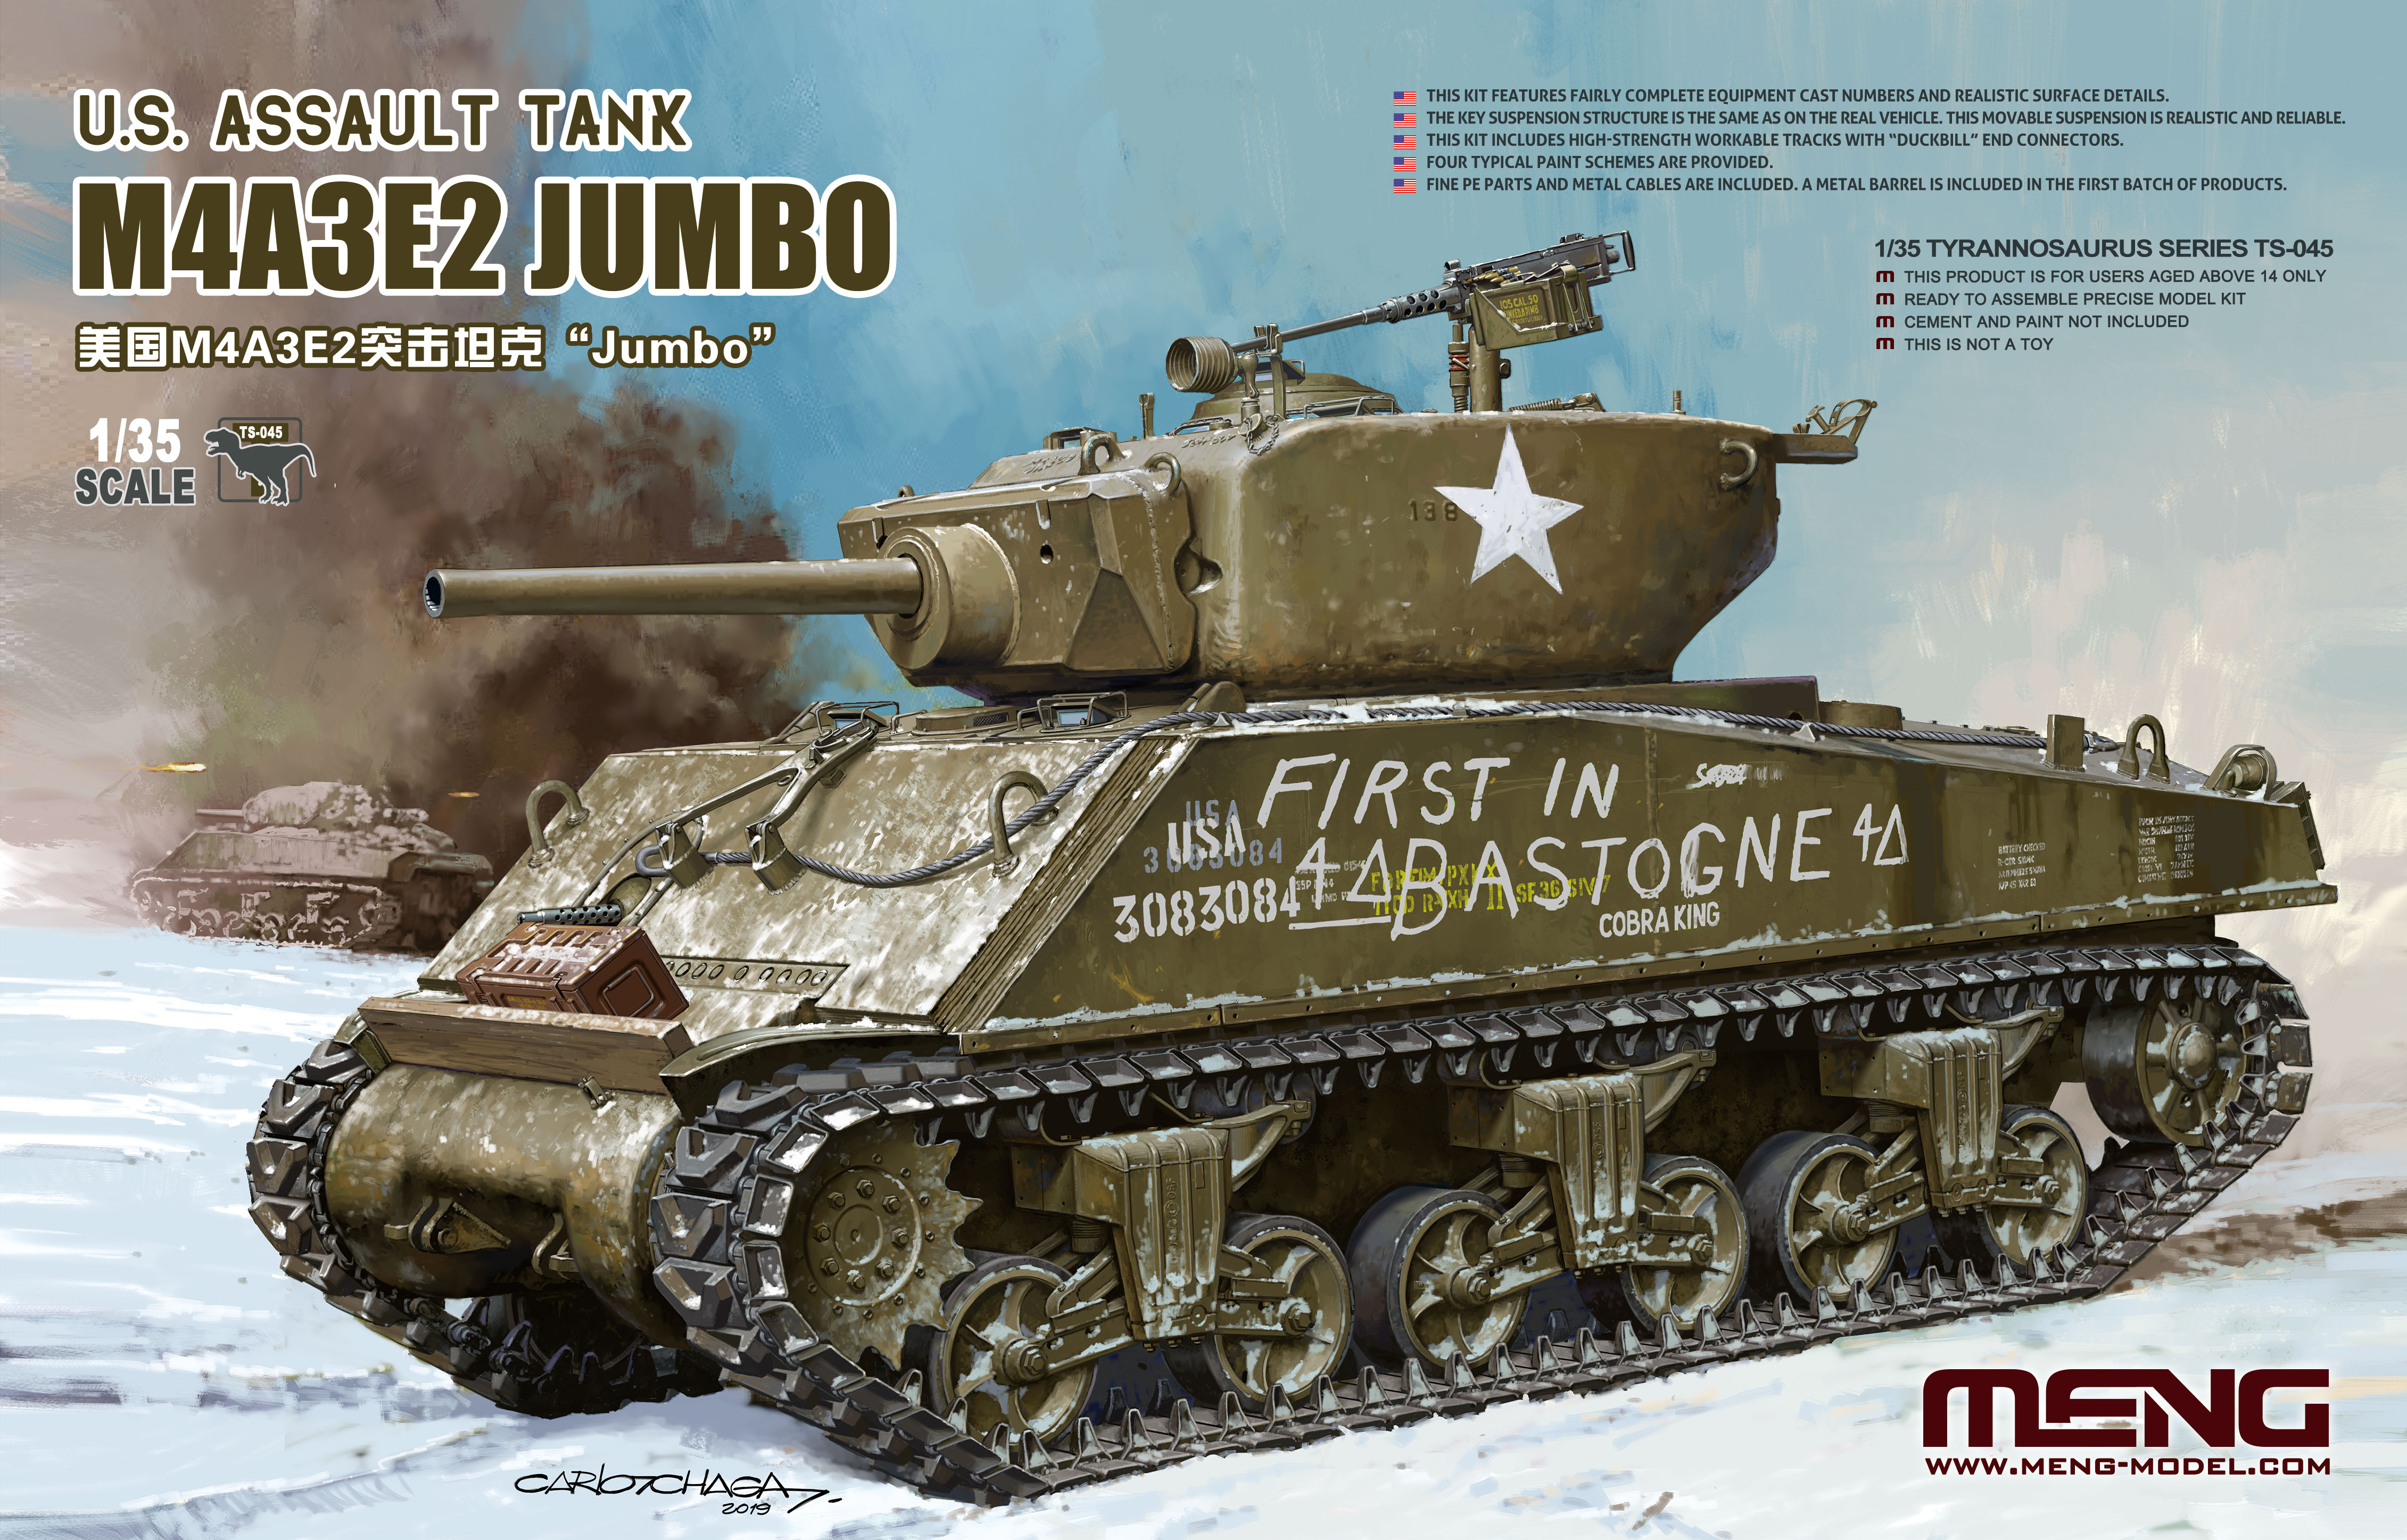 MENG TS-045 1/35 U.S. ASSAULT TANK M4A3E2 JUMBO TRRANNOSAURUS SERIES MODEL 2019